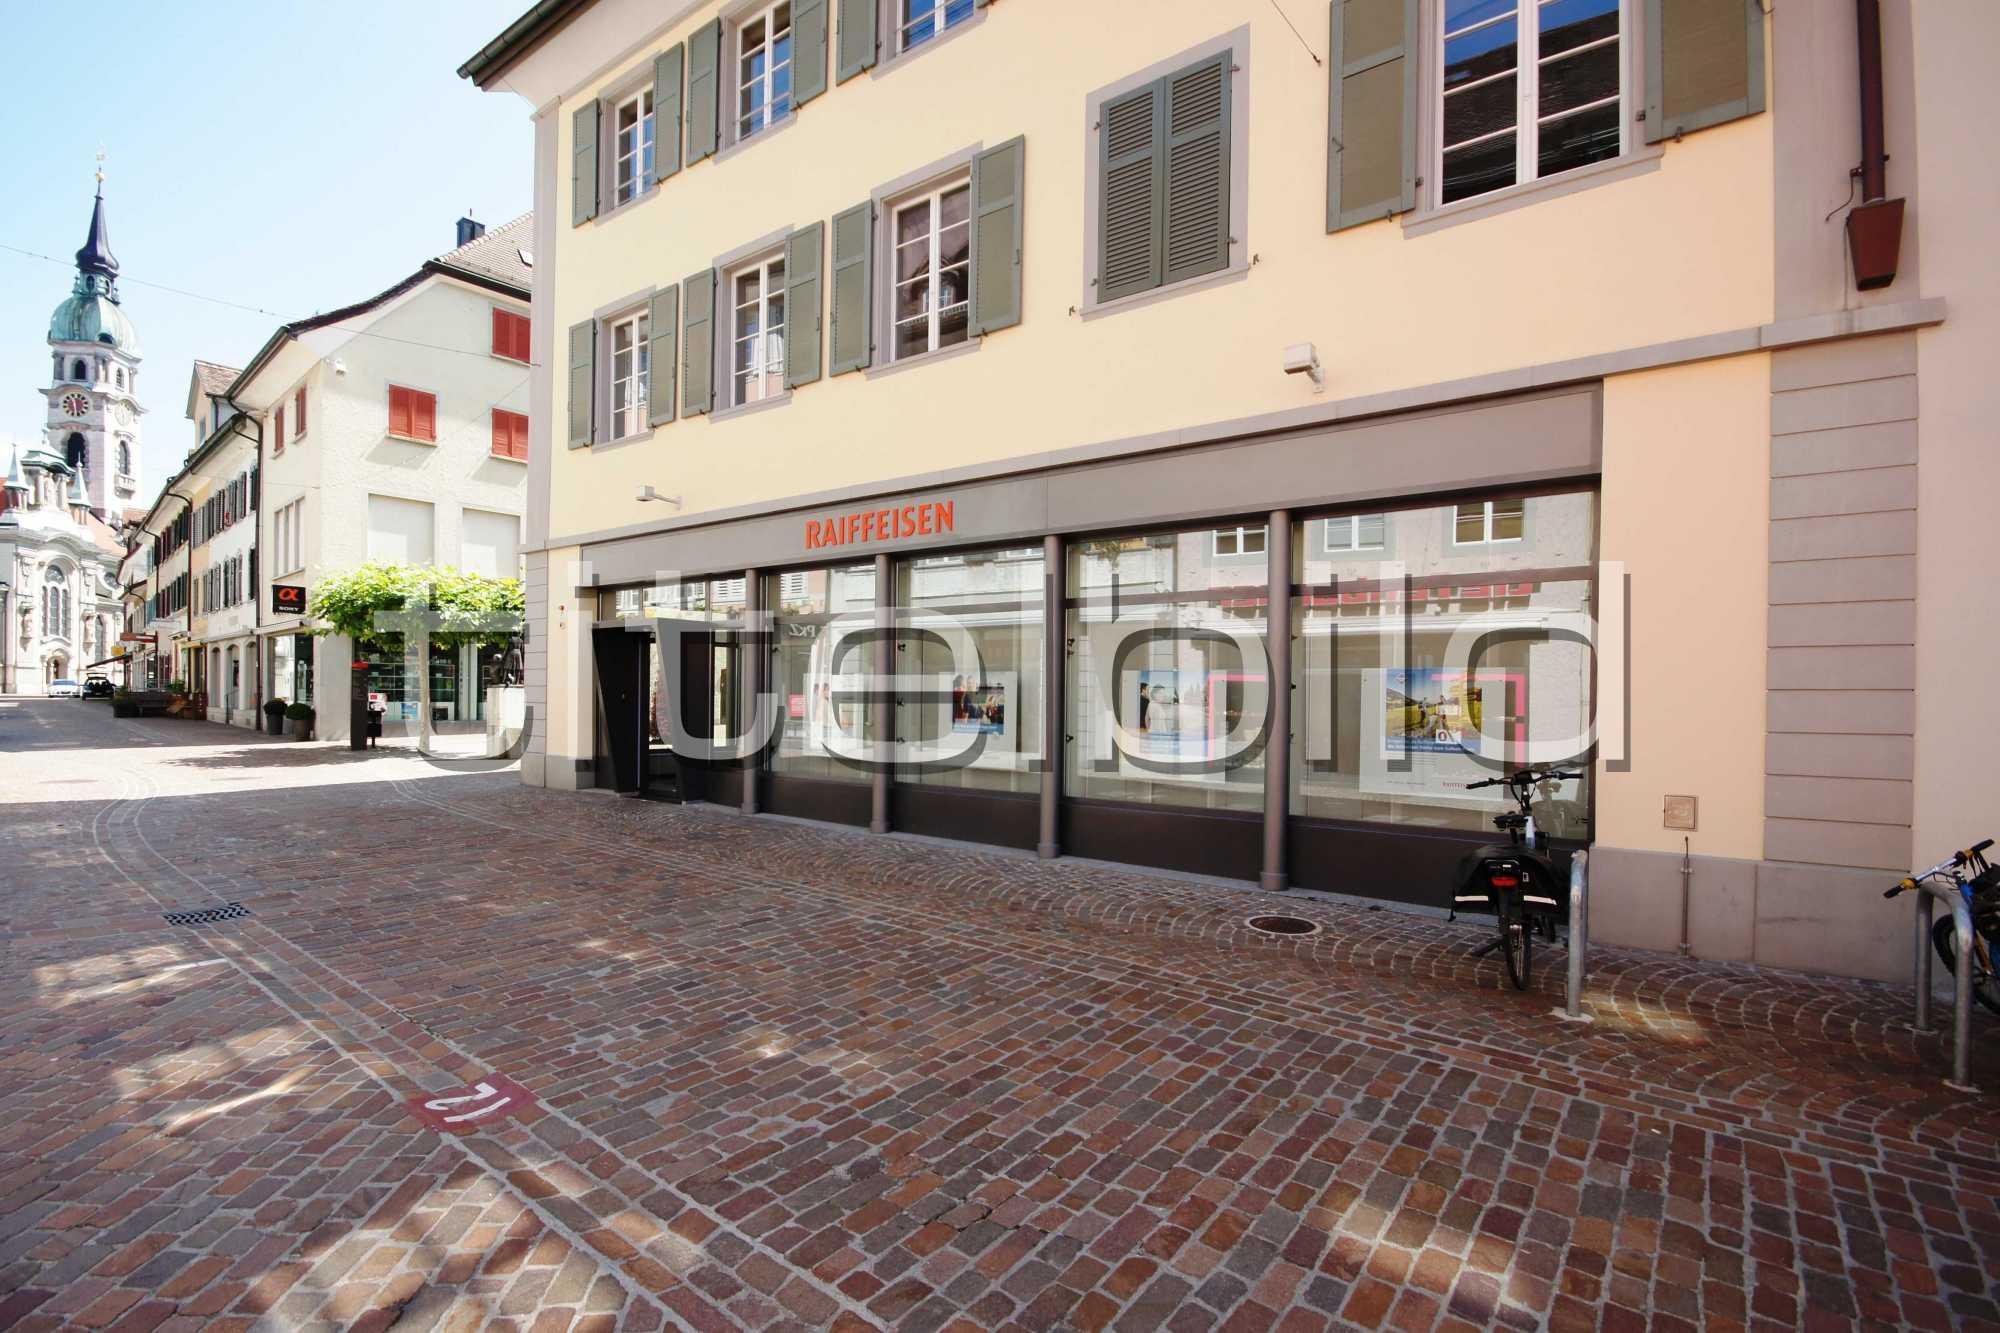 Projektbild-Nr. 3: Bankgebäude der Raiffeisenbank Frauenfeld